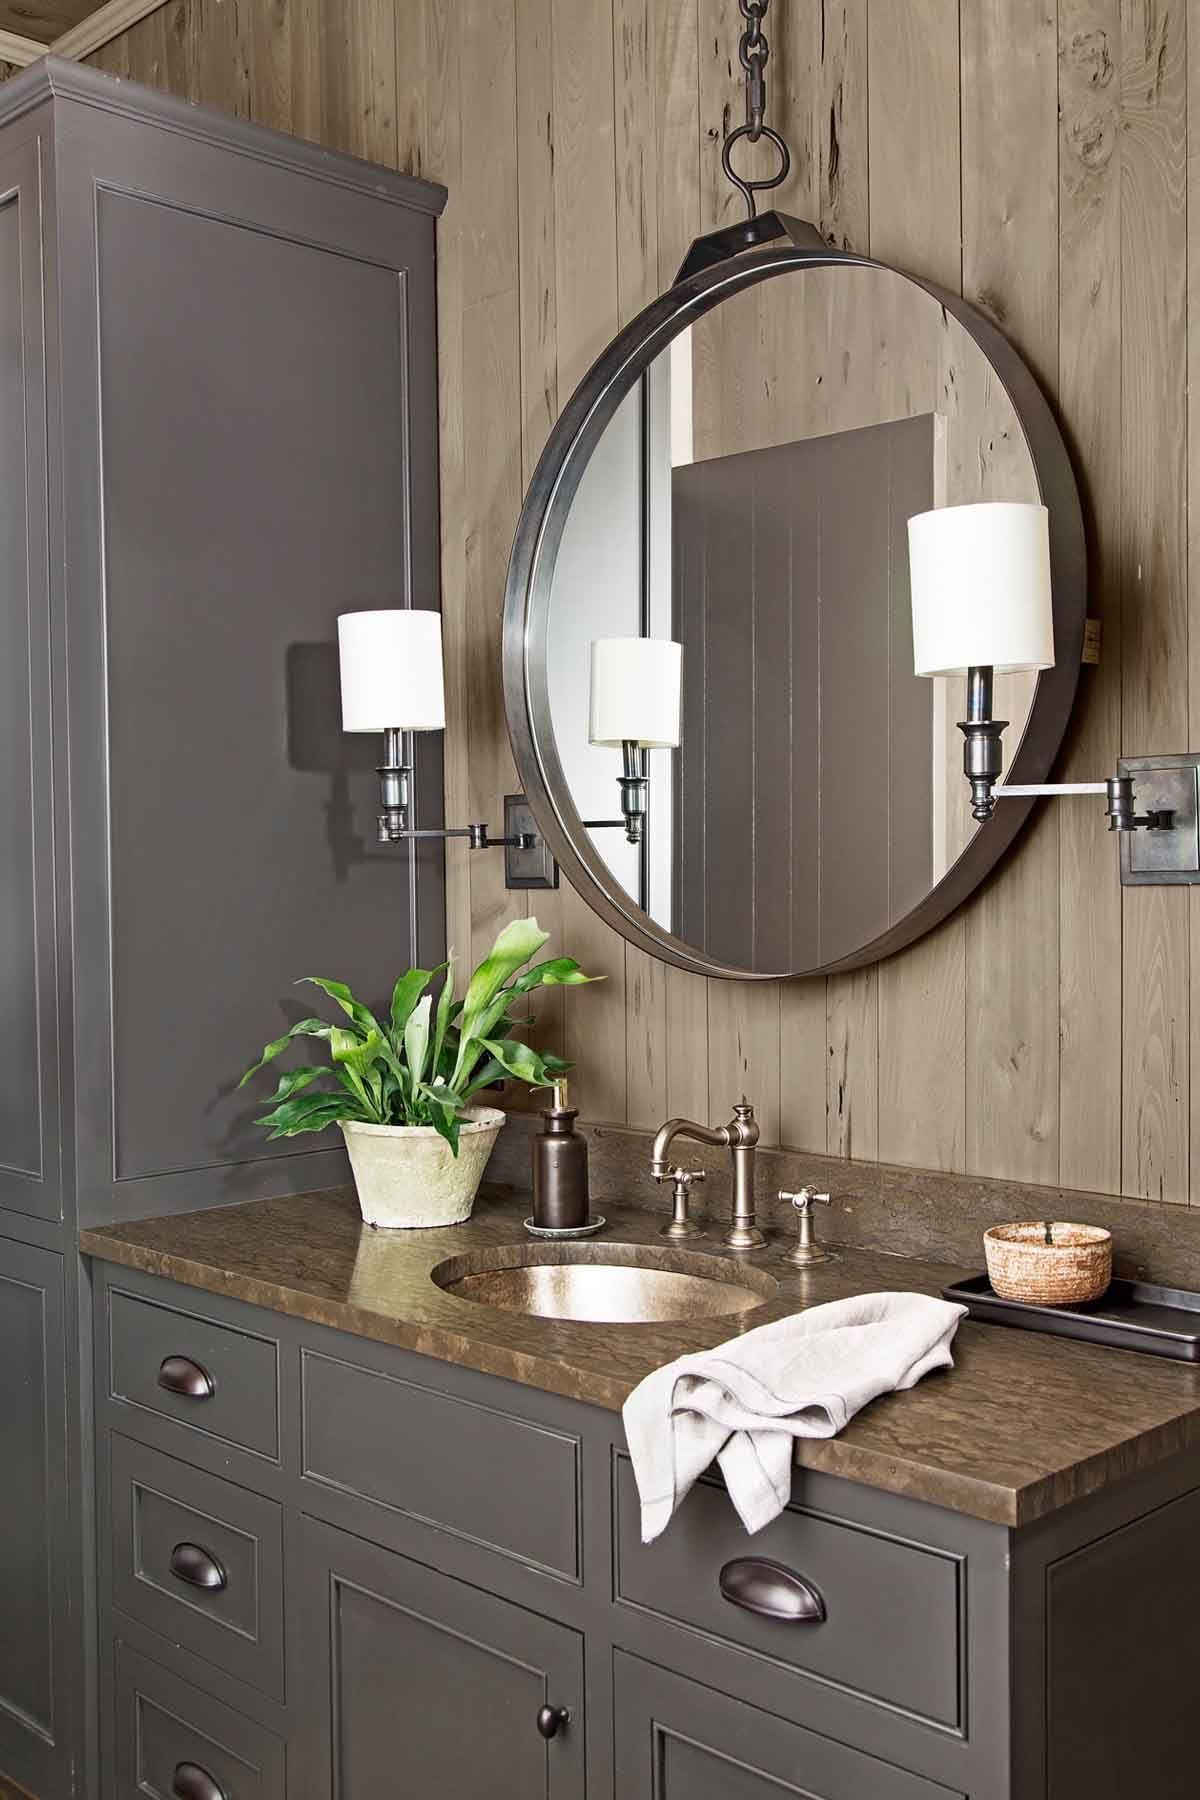 47 Rustic Bathrooms That Will Inspire Your Next Makeover Rustic Bathroom Decor Rustic Bathroom Wall Decor Modern Bathroom Decor